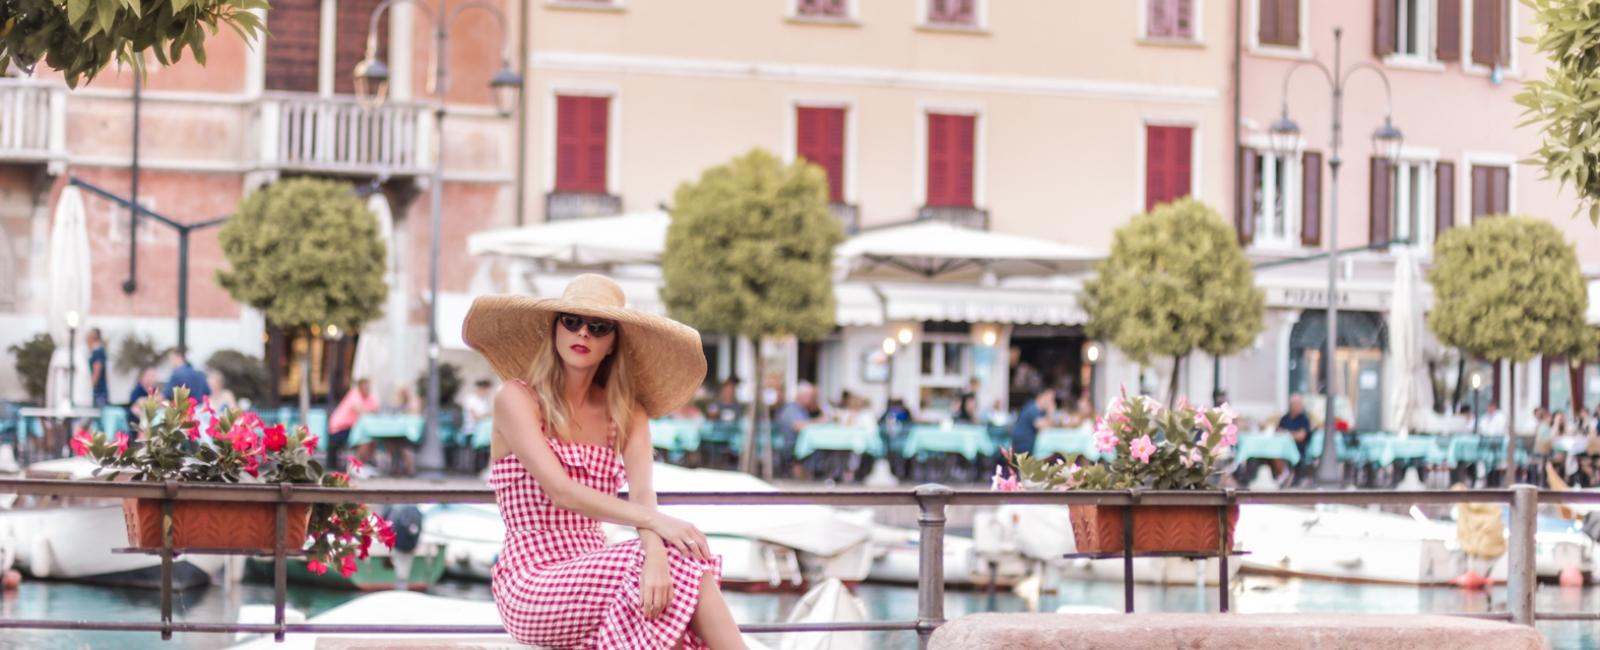 MOD-by-Monique-Lifestyle-Travel-Lago-di-Garda-Traveldiary-32